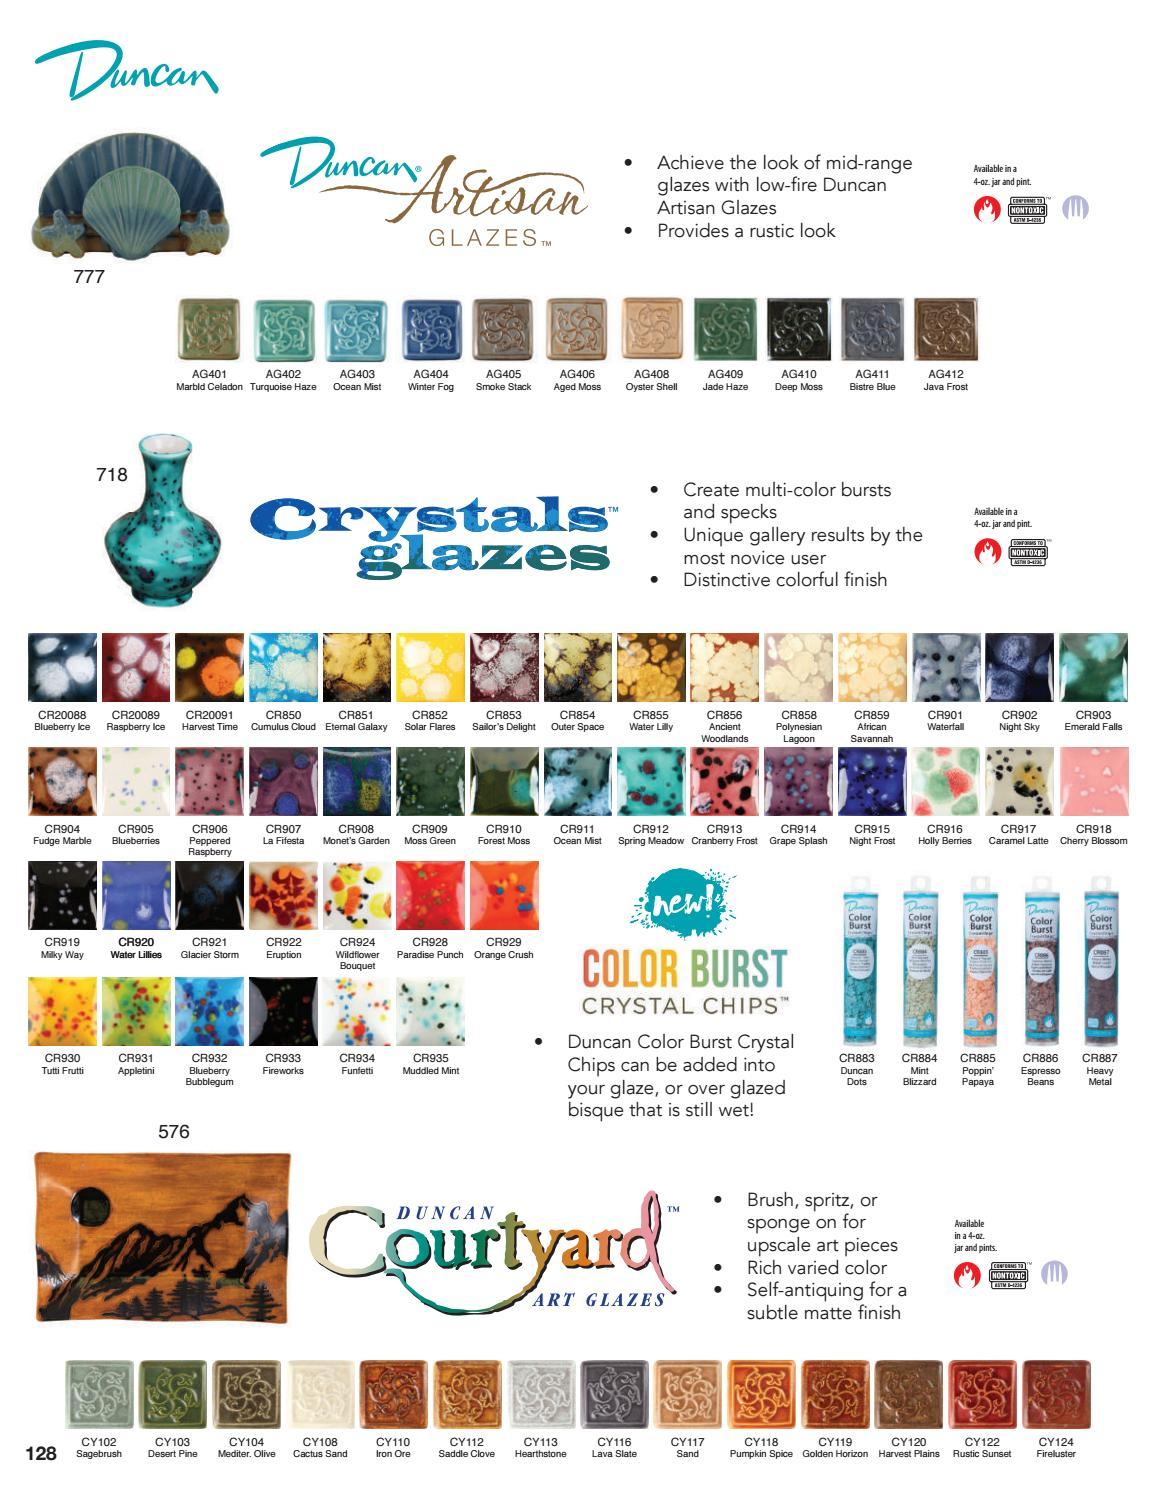 Cranberry Frost 4 Ounce Bottle CR 913 Duncan Crystals Glaze